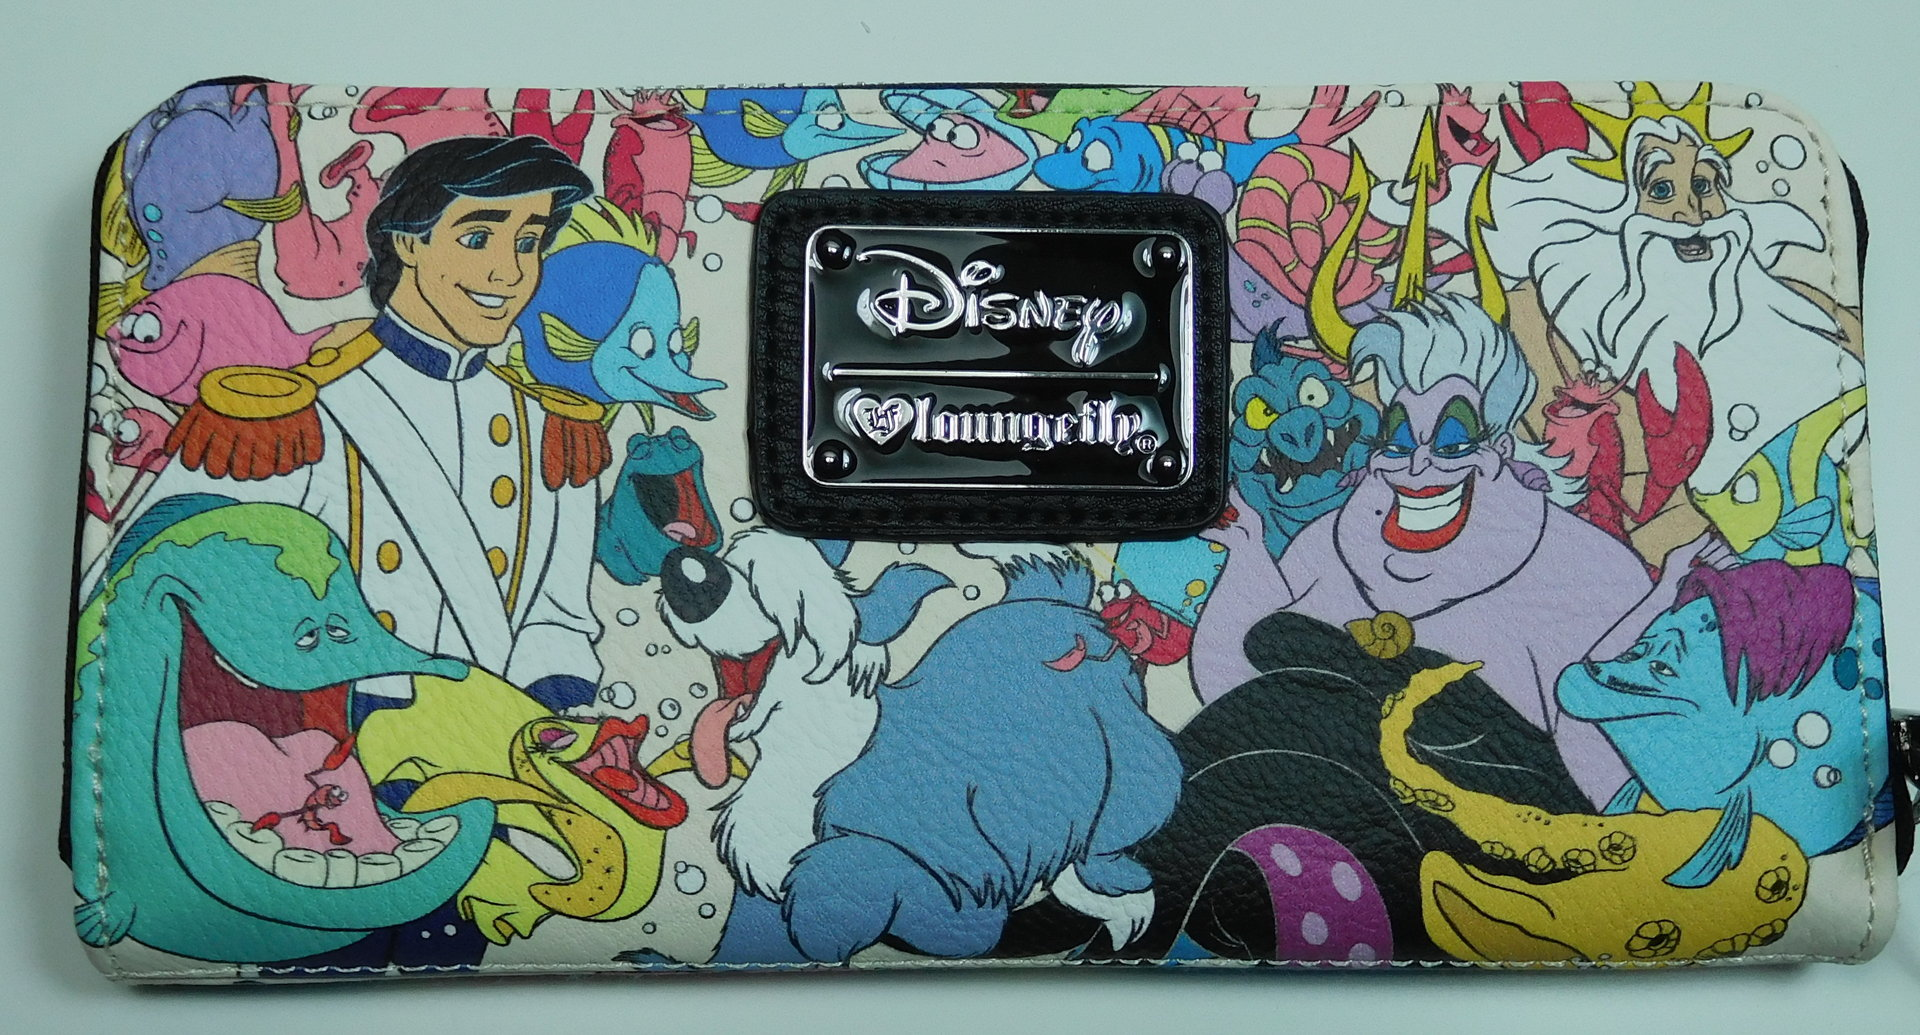 Loungefly Disney Portemonnaie Geldbörse Arielle Die Meerjungfrau Ursula Eric